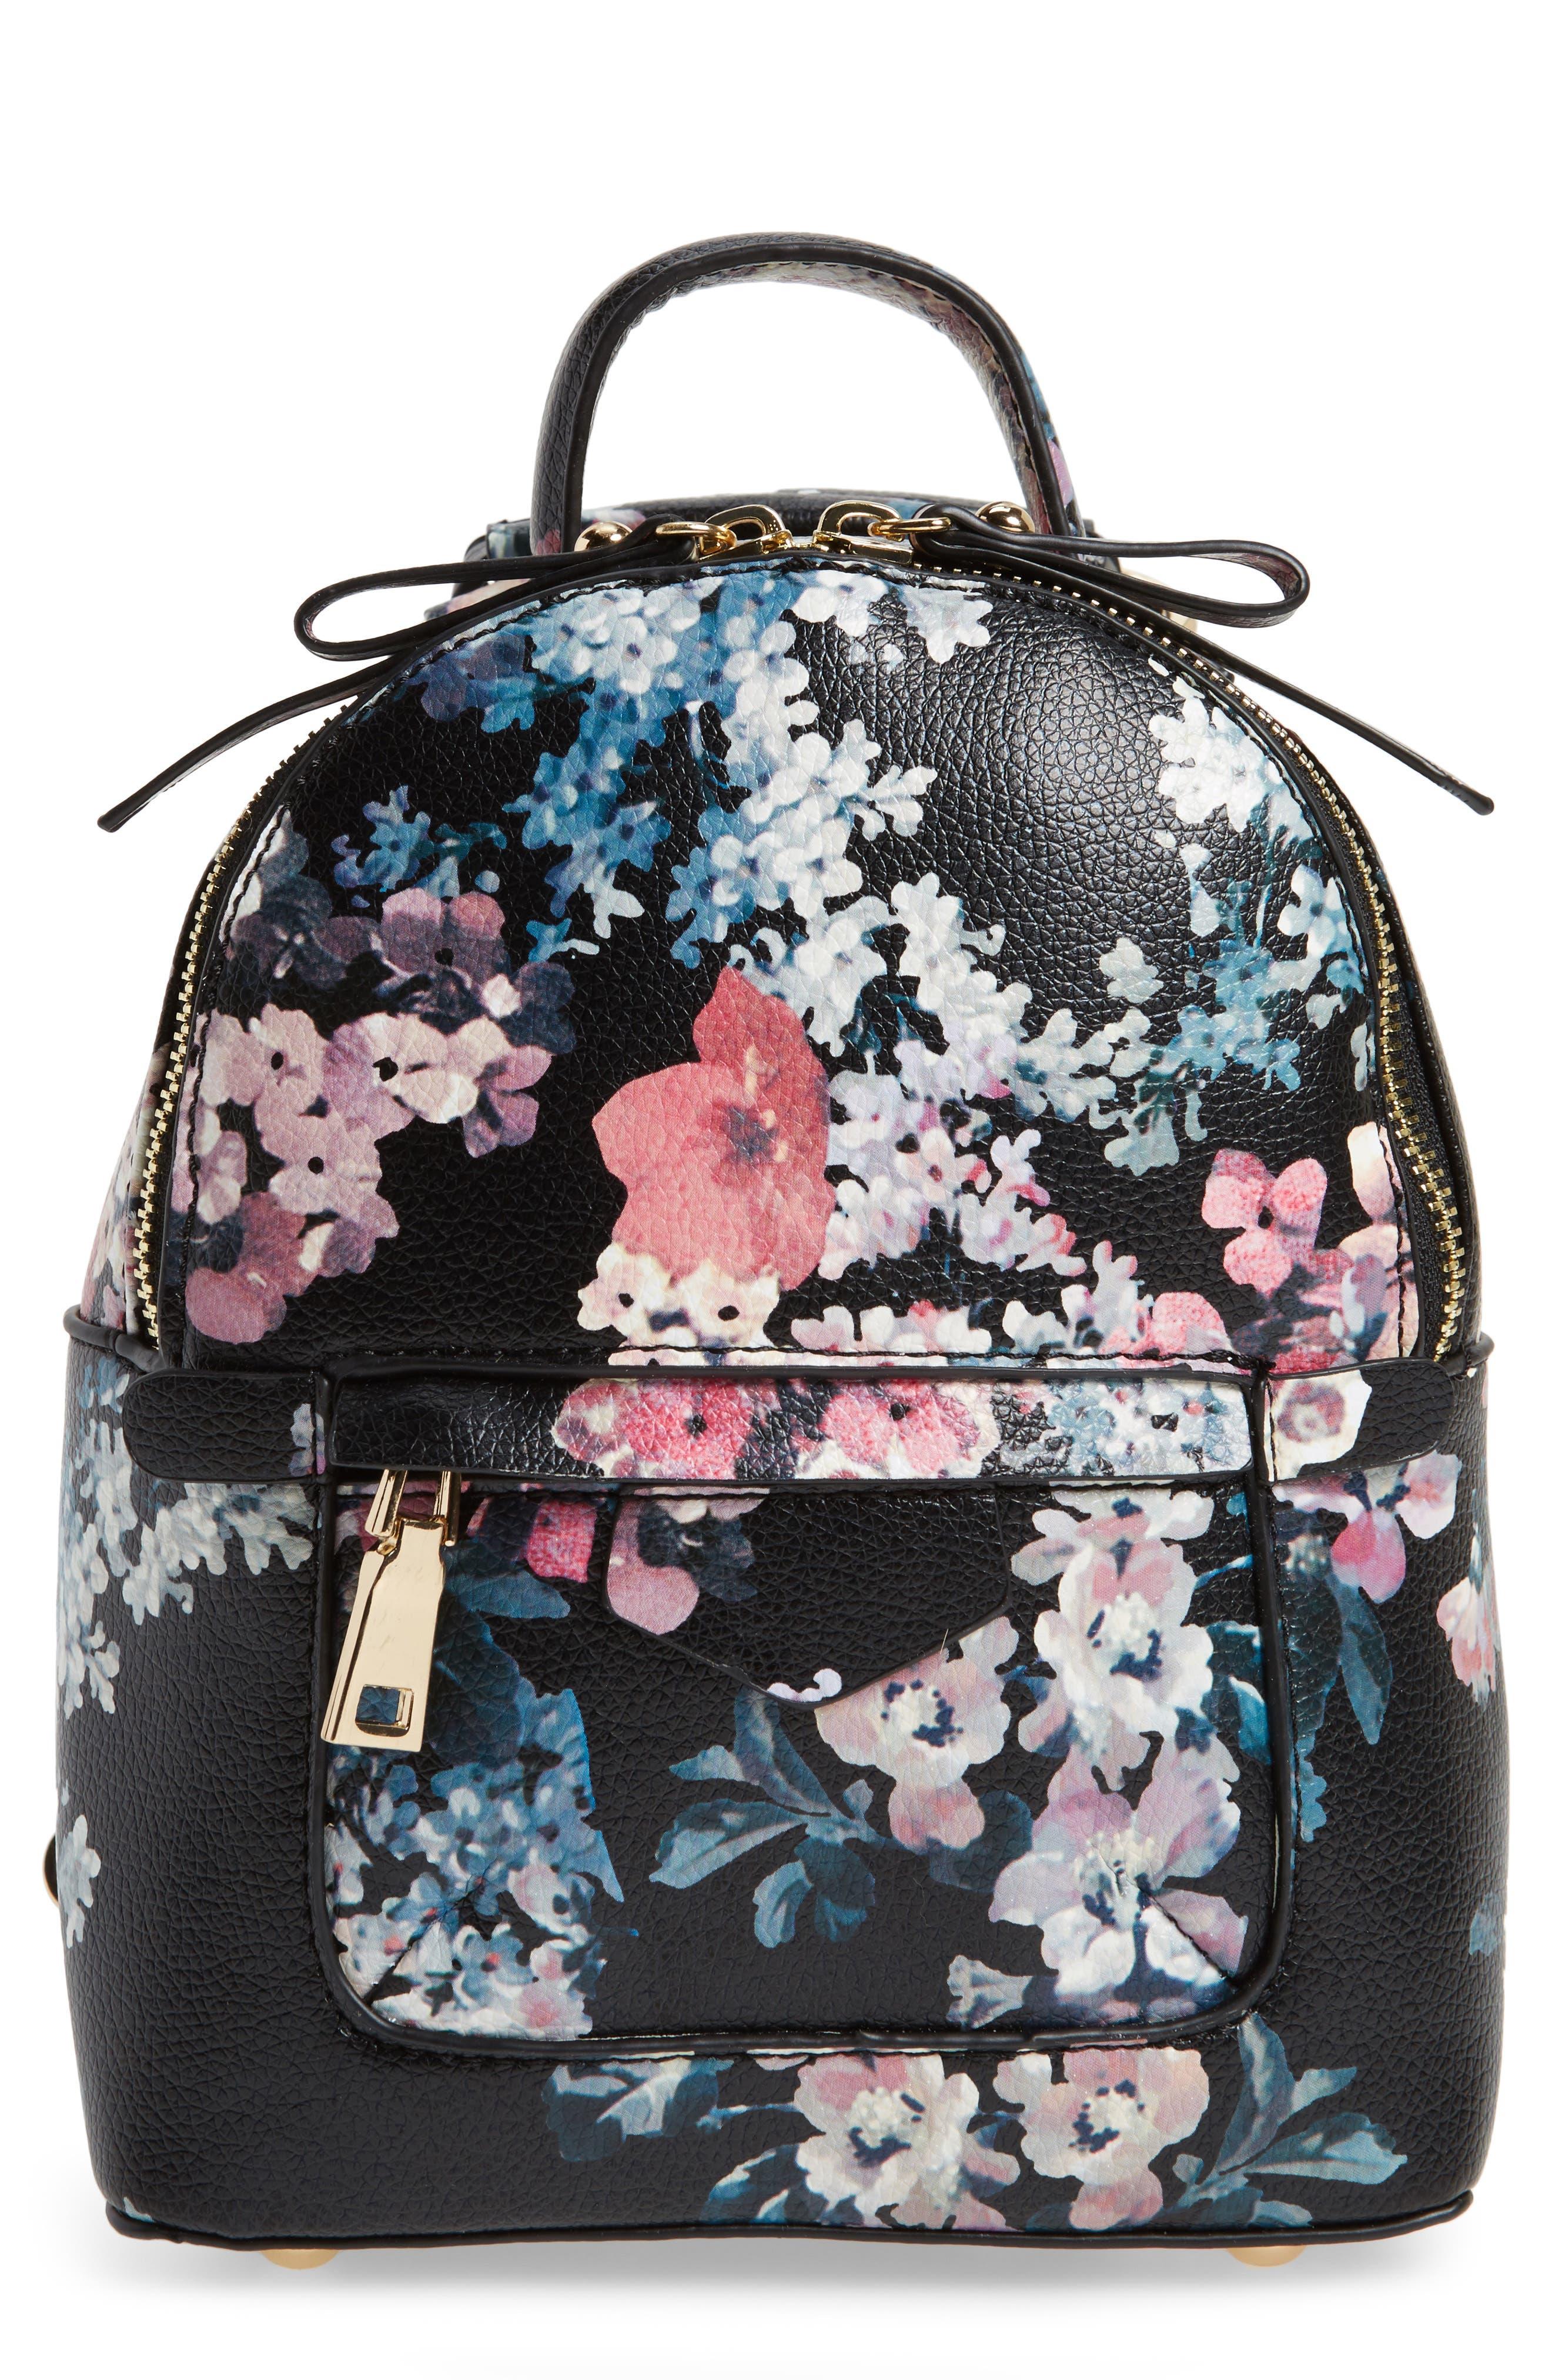 Mini Floral Faux Leather Mini Backpack,                             Main thumbnail 1, color,                             Black Floral